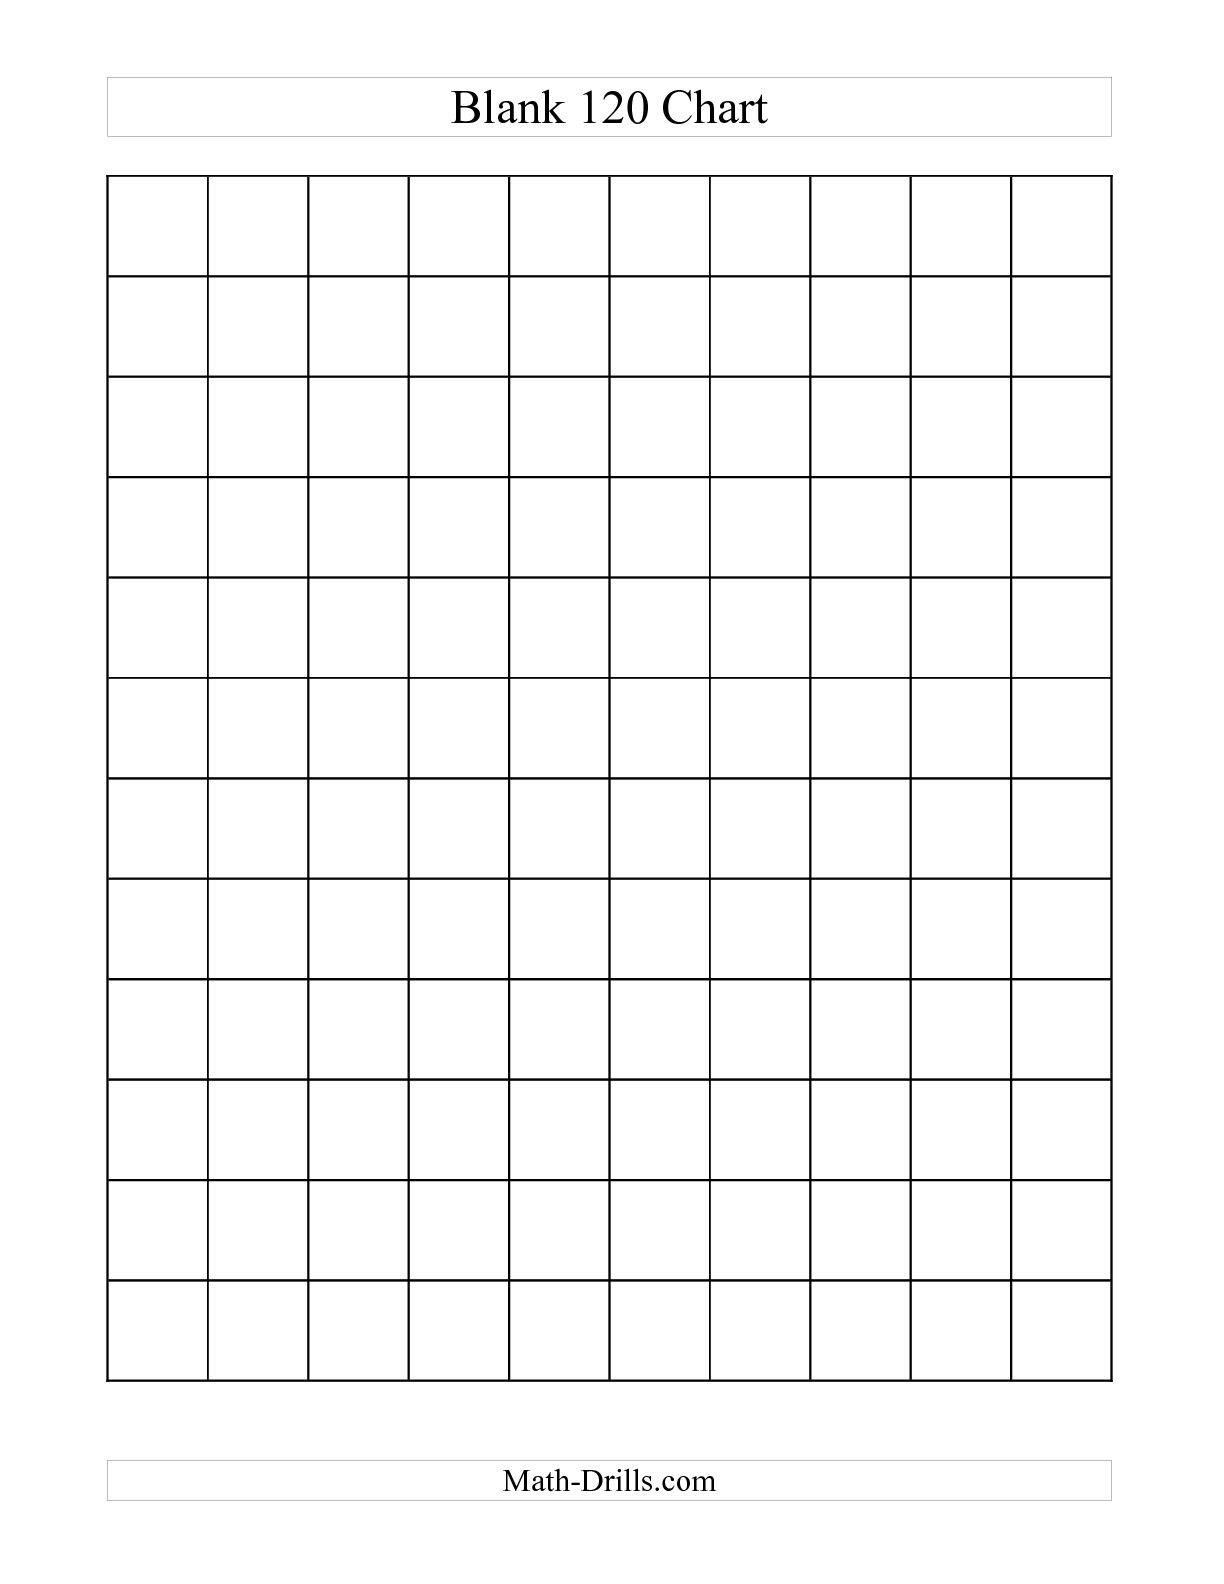 Worksheet. Blank 100 Chart For Kindergarten. Mikyu Free Worksheet